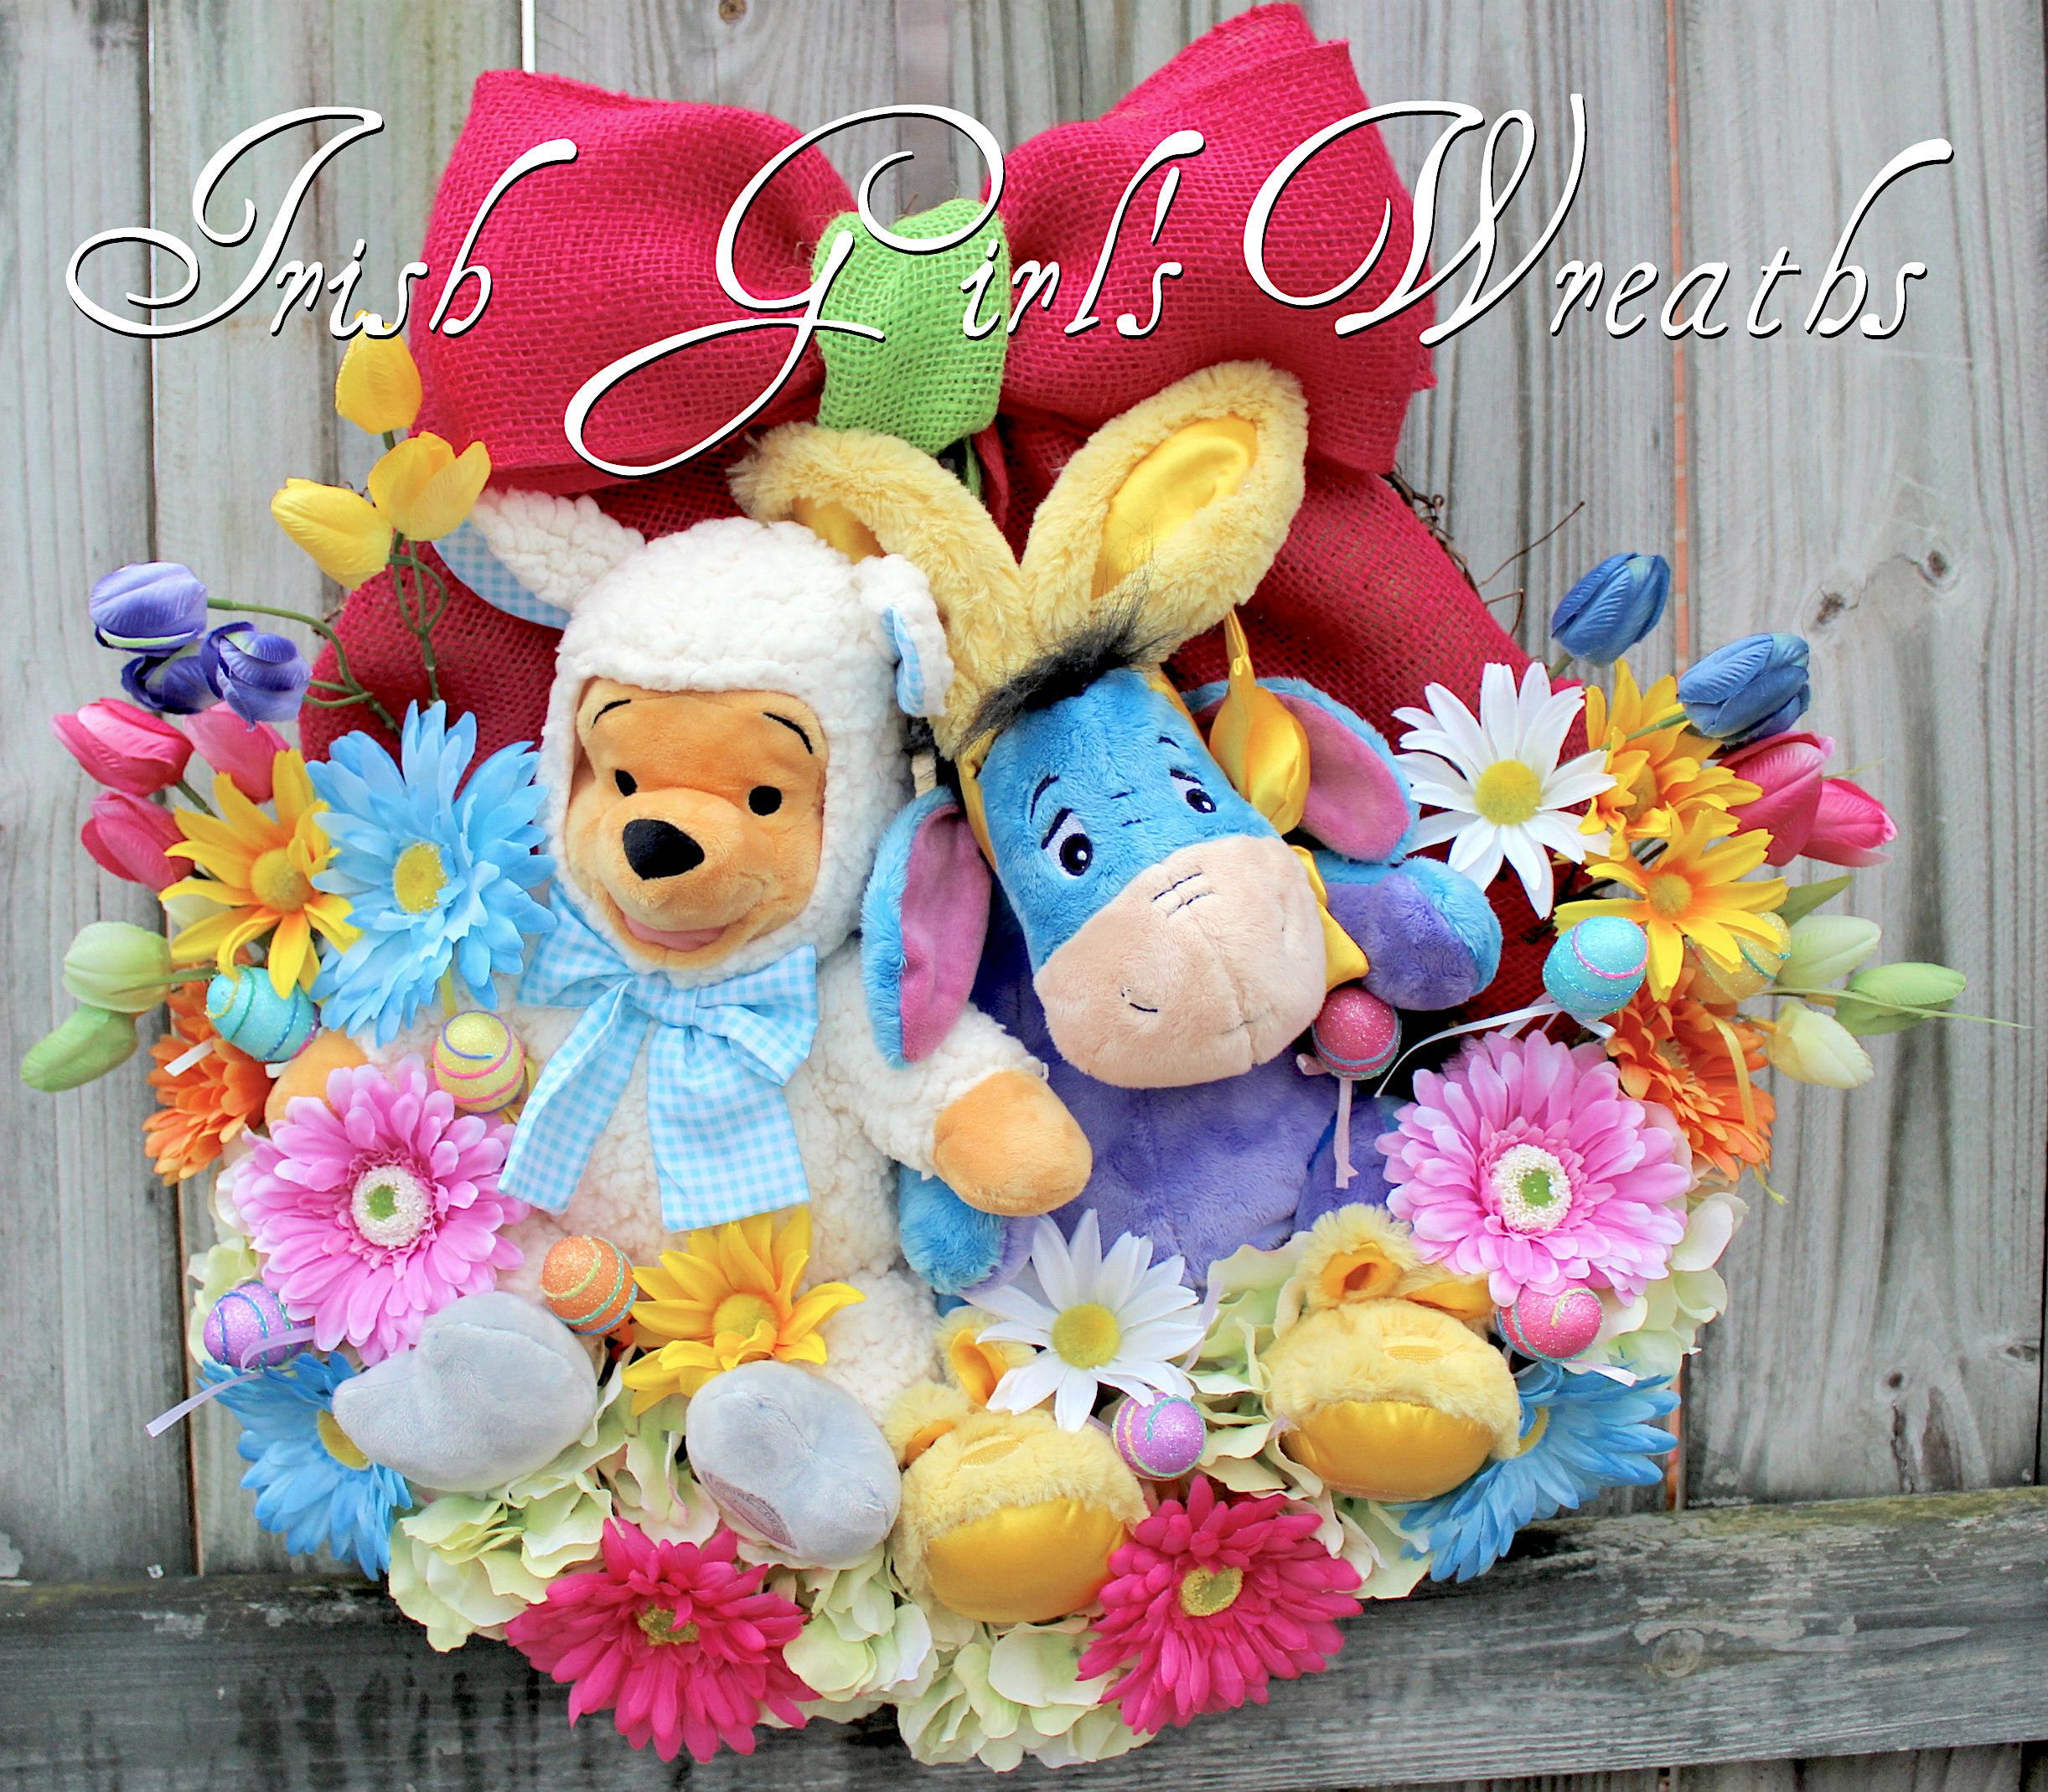 Winnie the Pooh and Eeyore Easter Wreath, Disney Easter Wreath, plush Lamb Pooh, Bunny Pajamas Eeyore